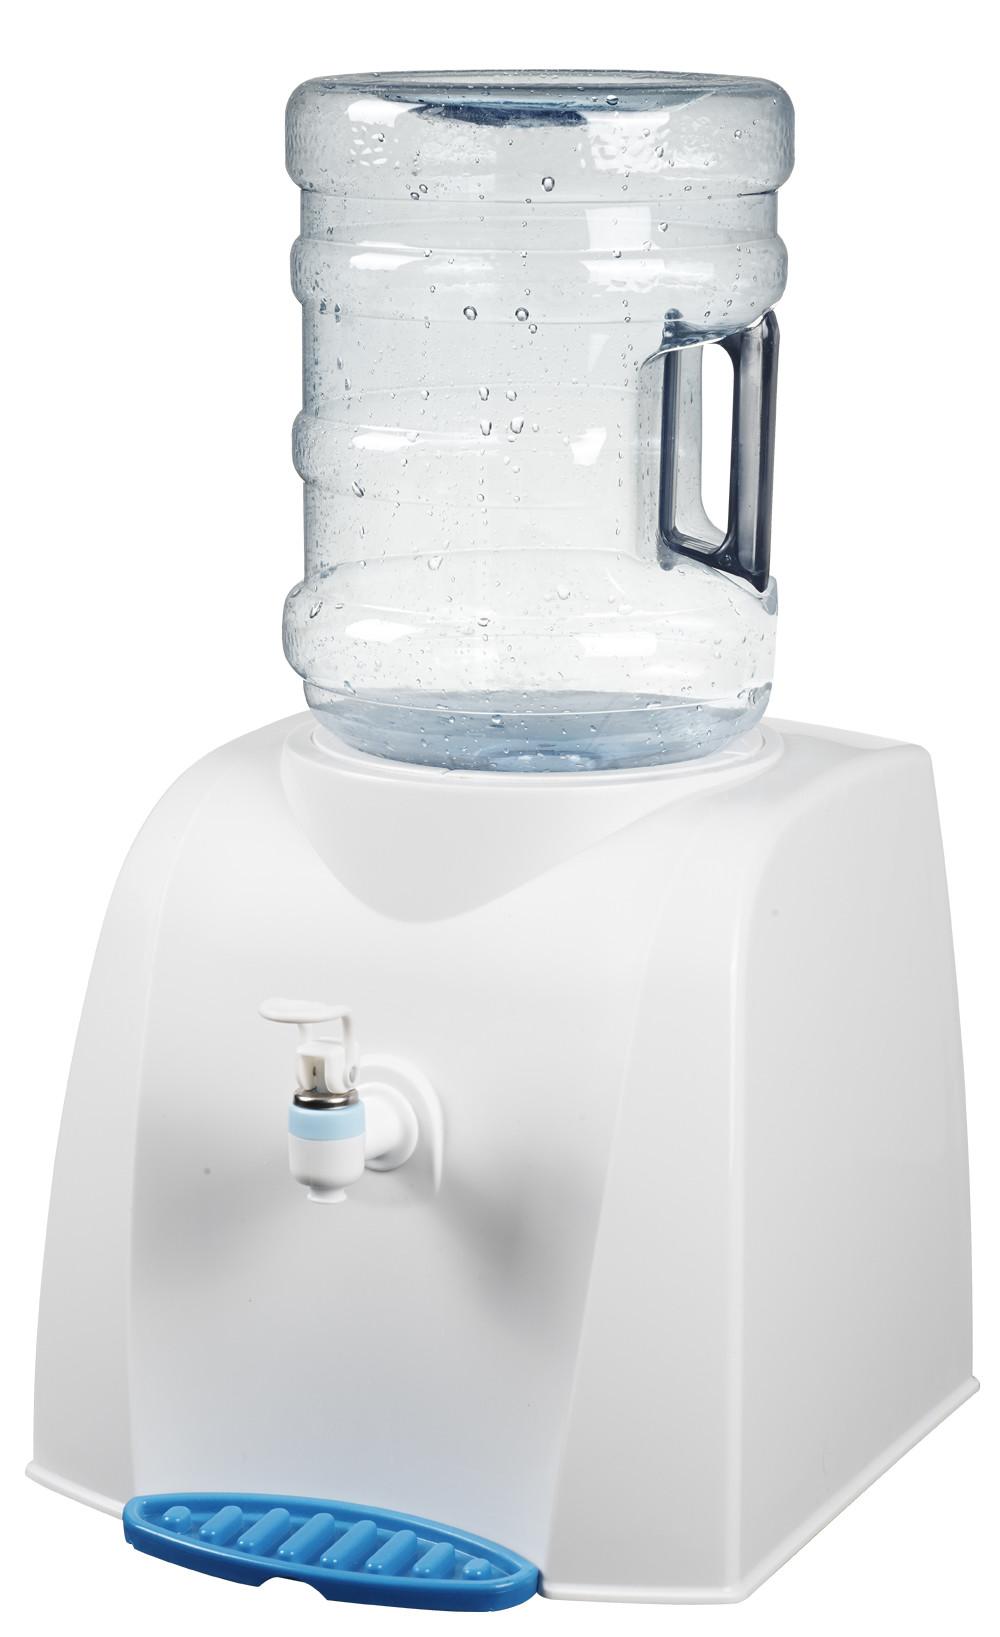 Dispenser Electric Walmart Non Water